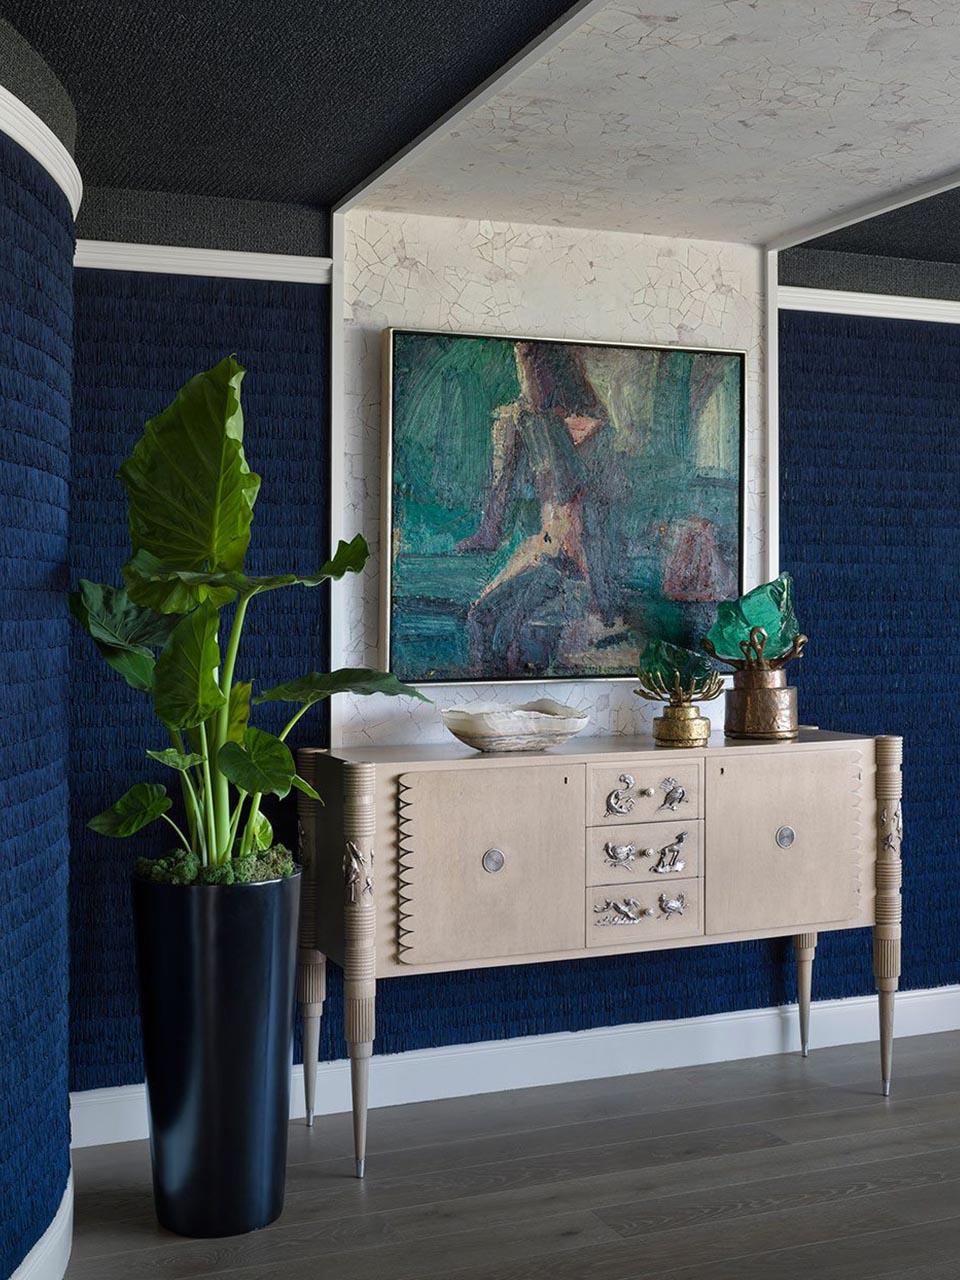 Popular Interior Design For Tv Showcase: Home Decor, Interior Design